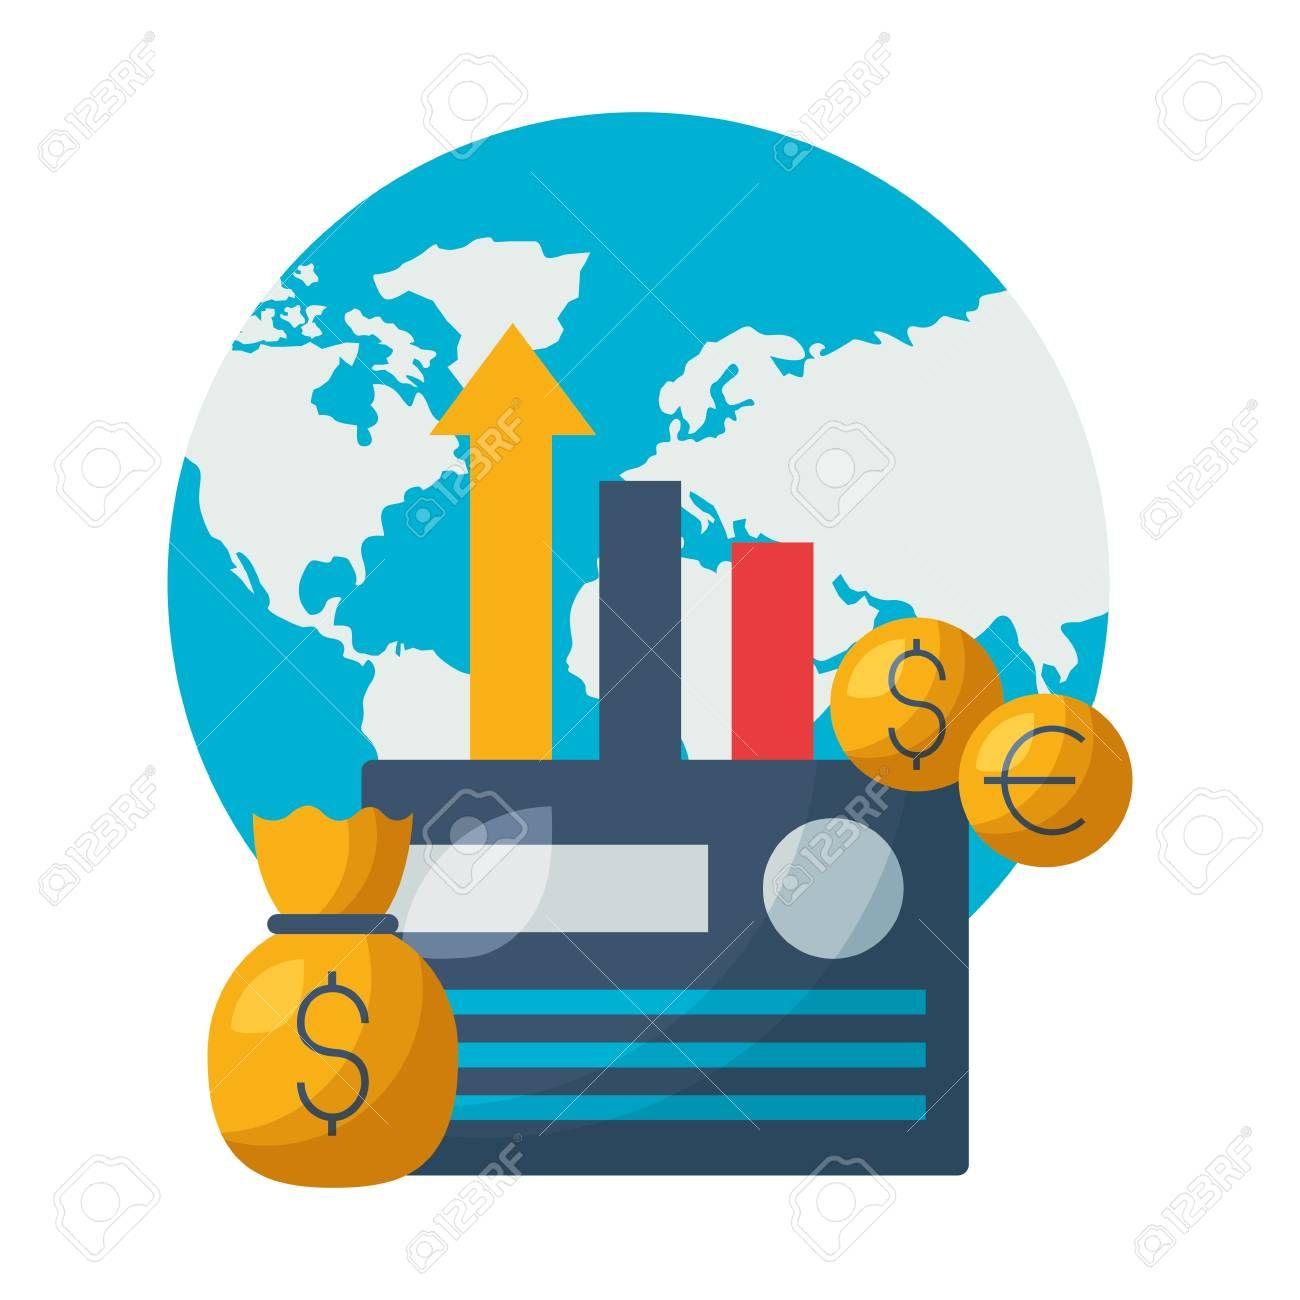 World Money Bank Card Money Stock Market Vector Illustration Illustration Affiliate Bank Card World Money Bank Card Vector Illustration Stock Market